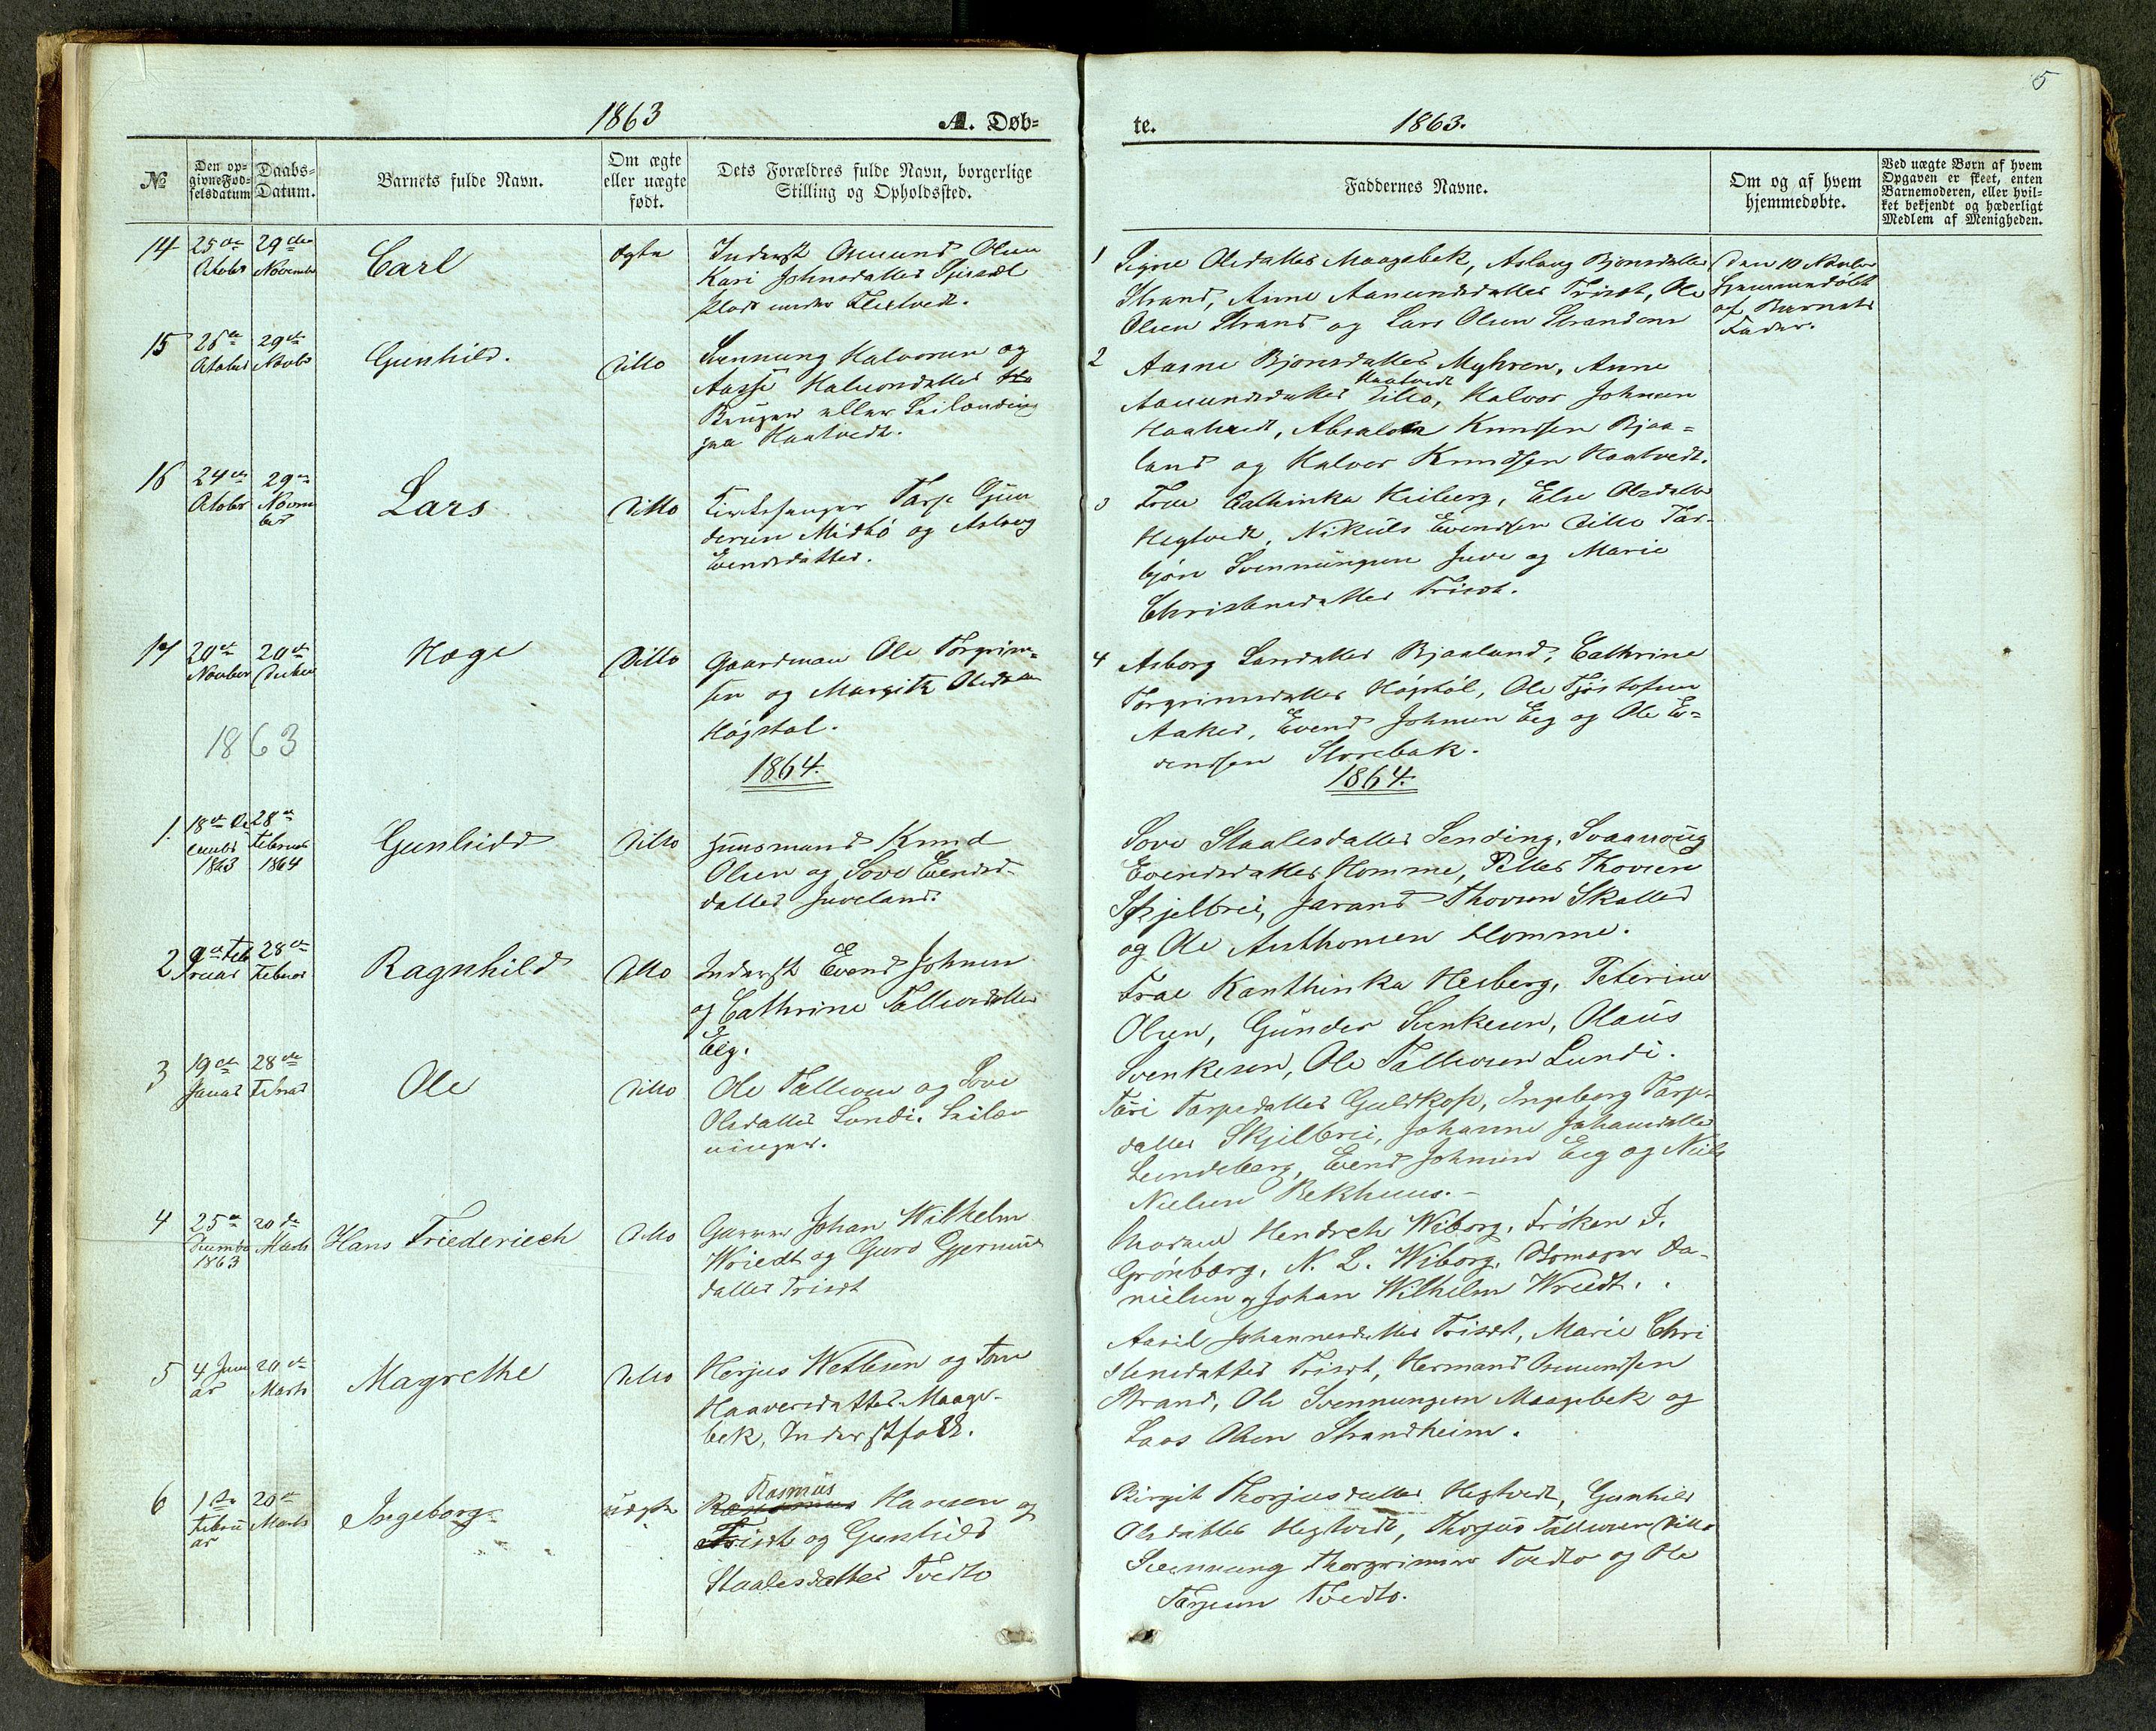 SAKO, Lårdal kirkebøker, G/Ga/L0002: Klokkerbok nr. I 2, 1861-1890, s. 5